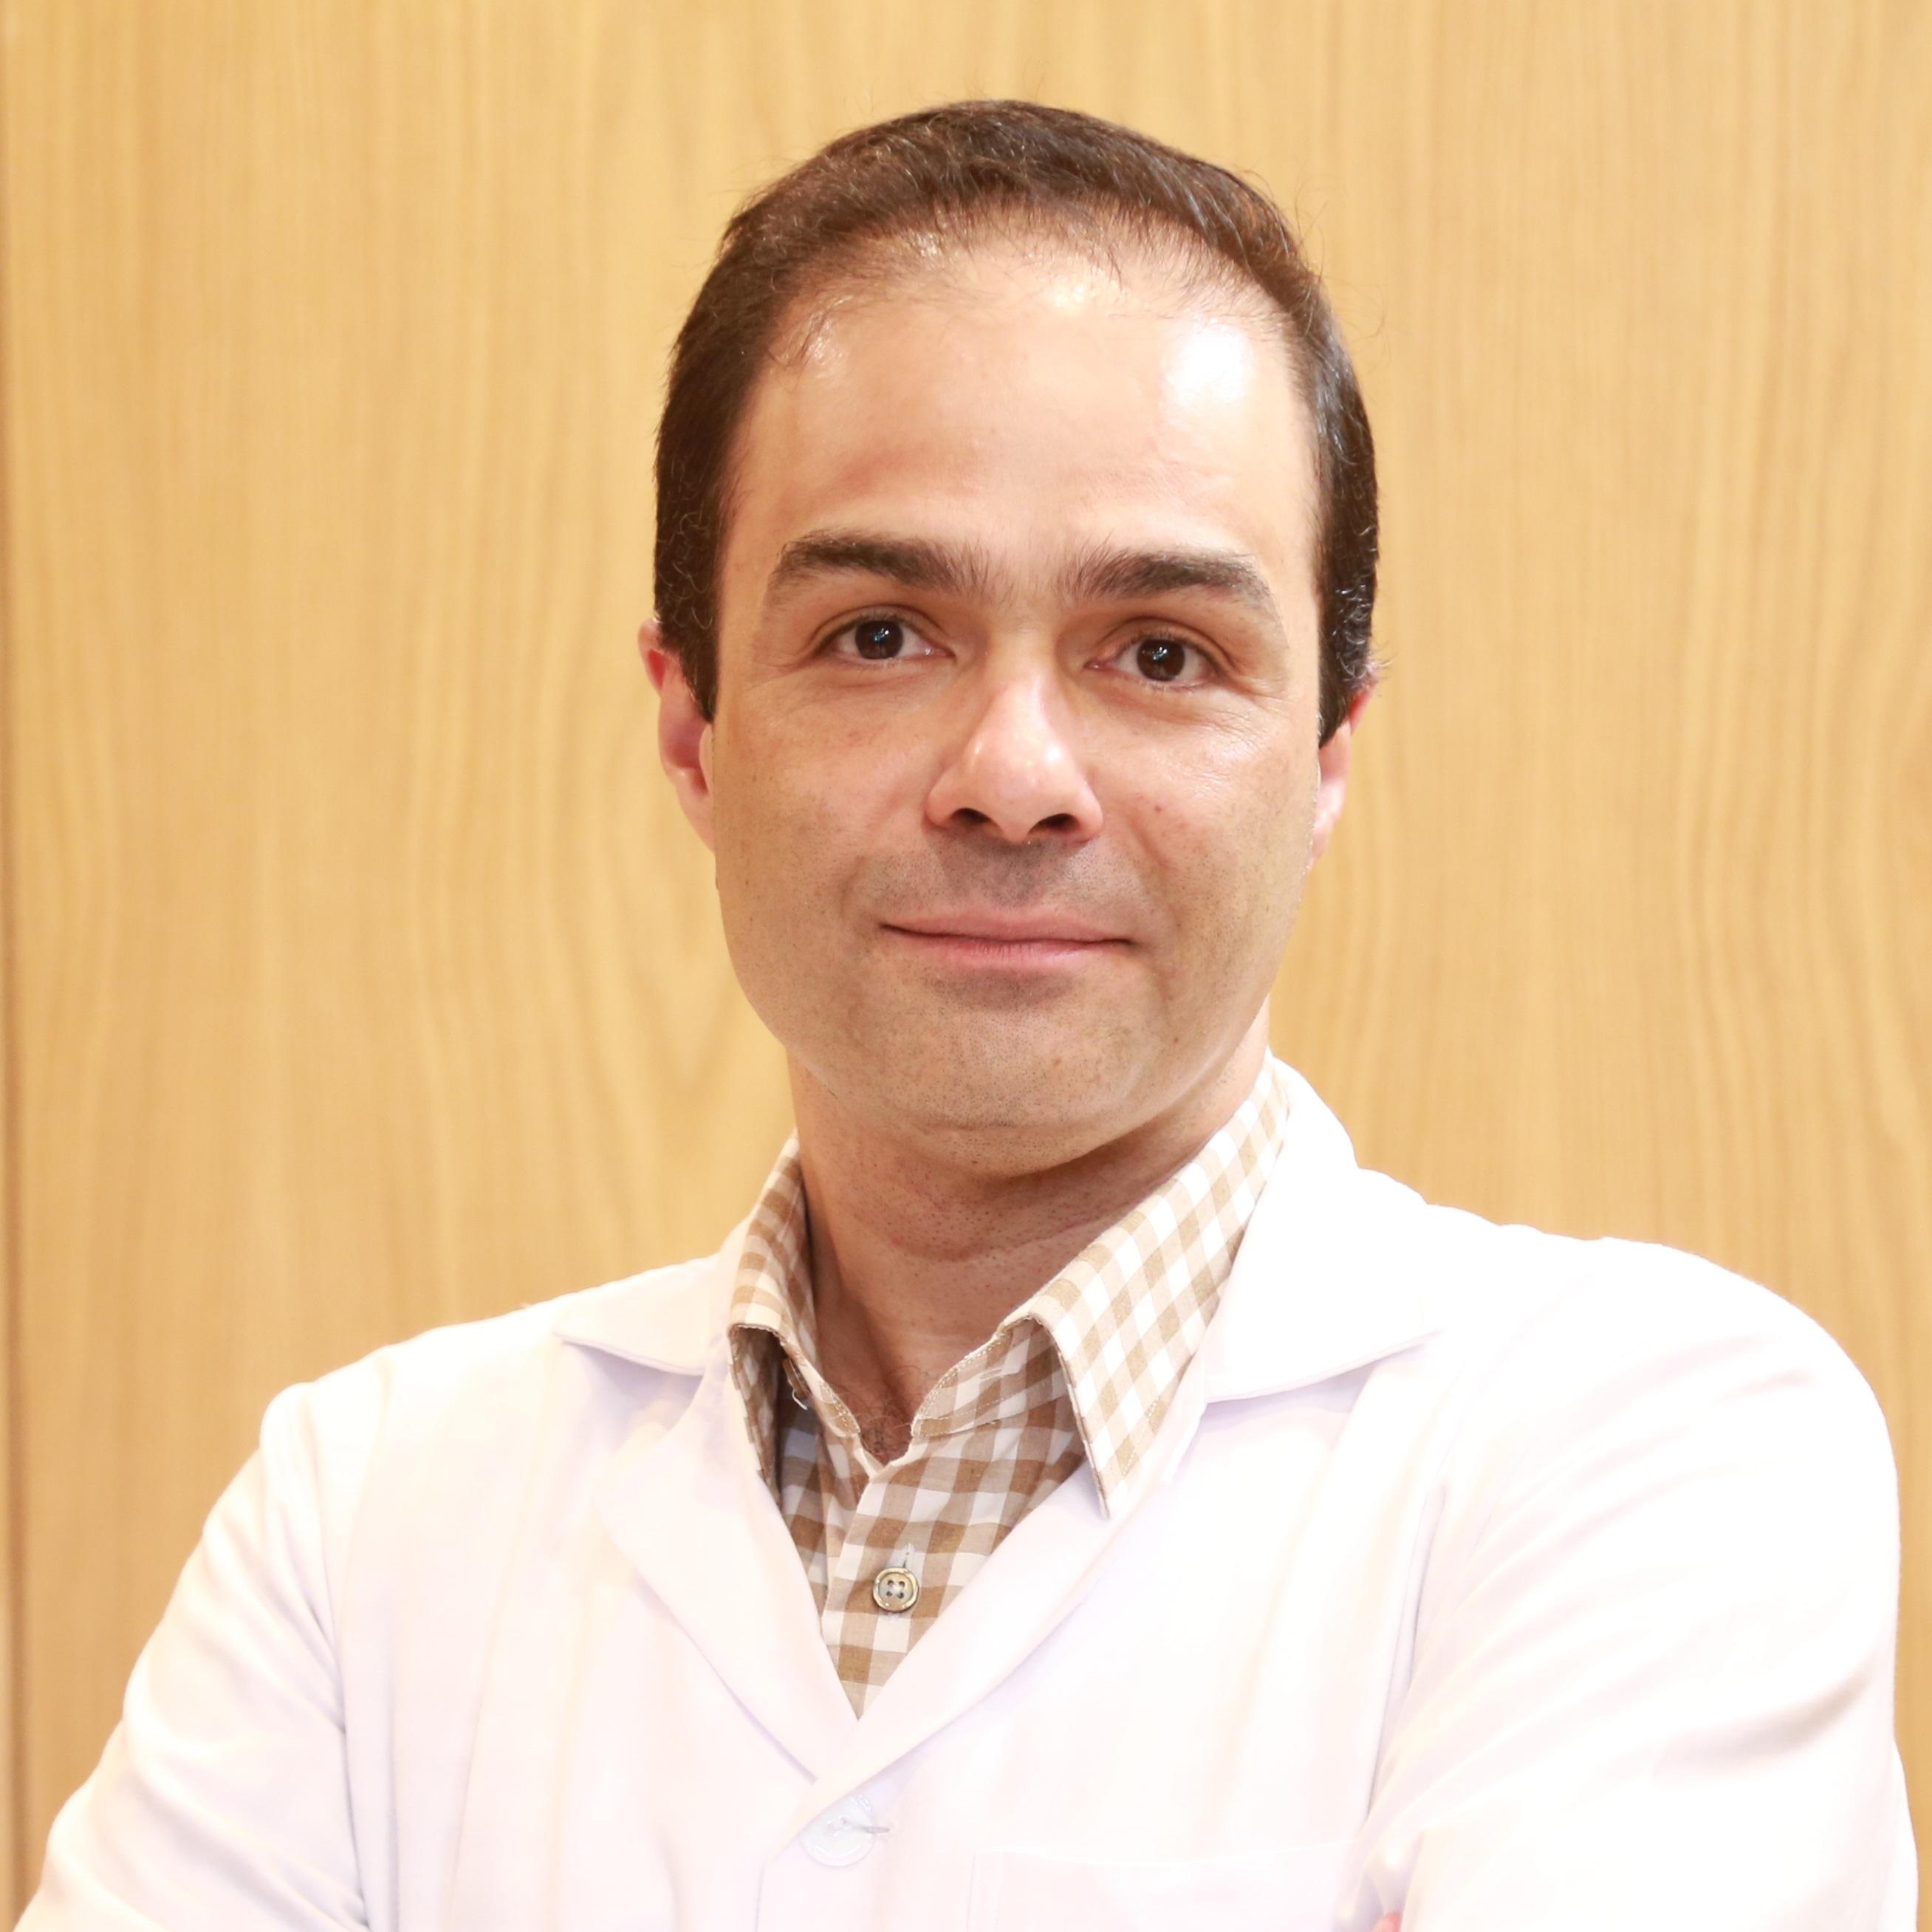 دکتر حمیدرضا علیپور تبریزی